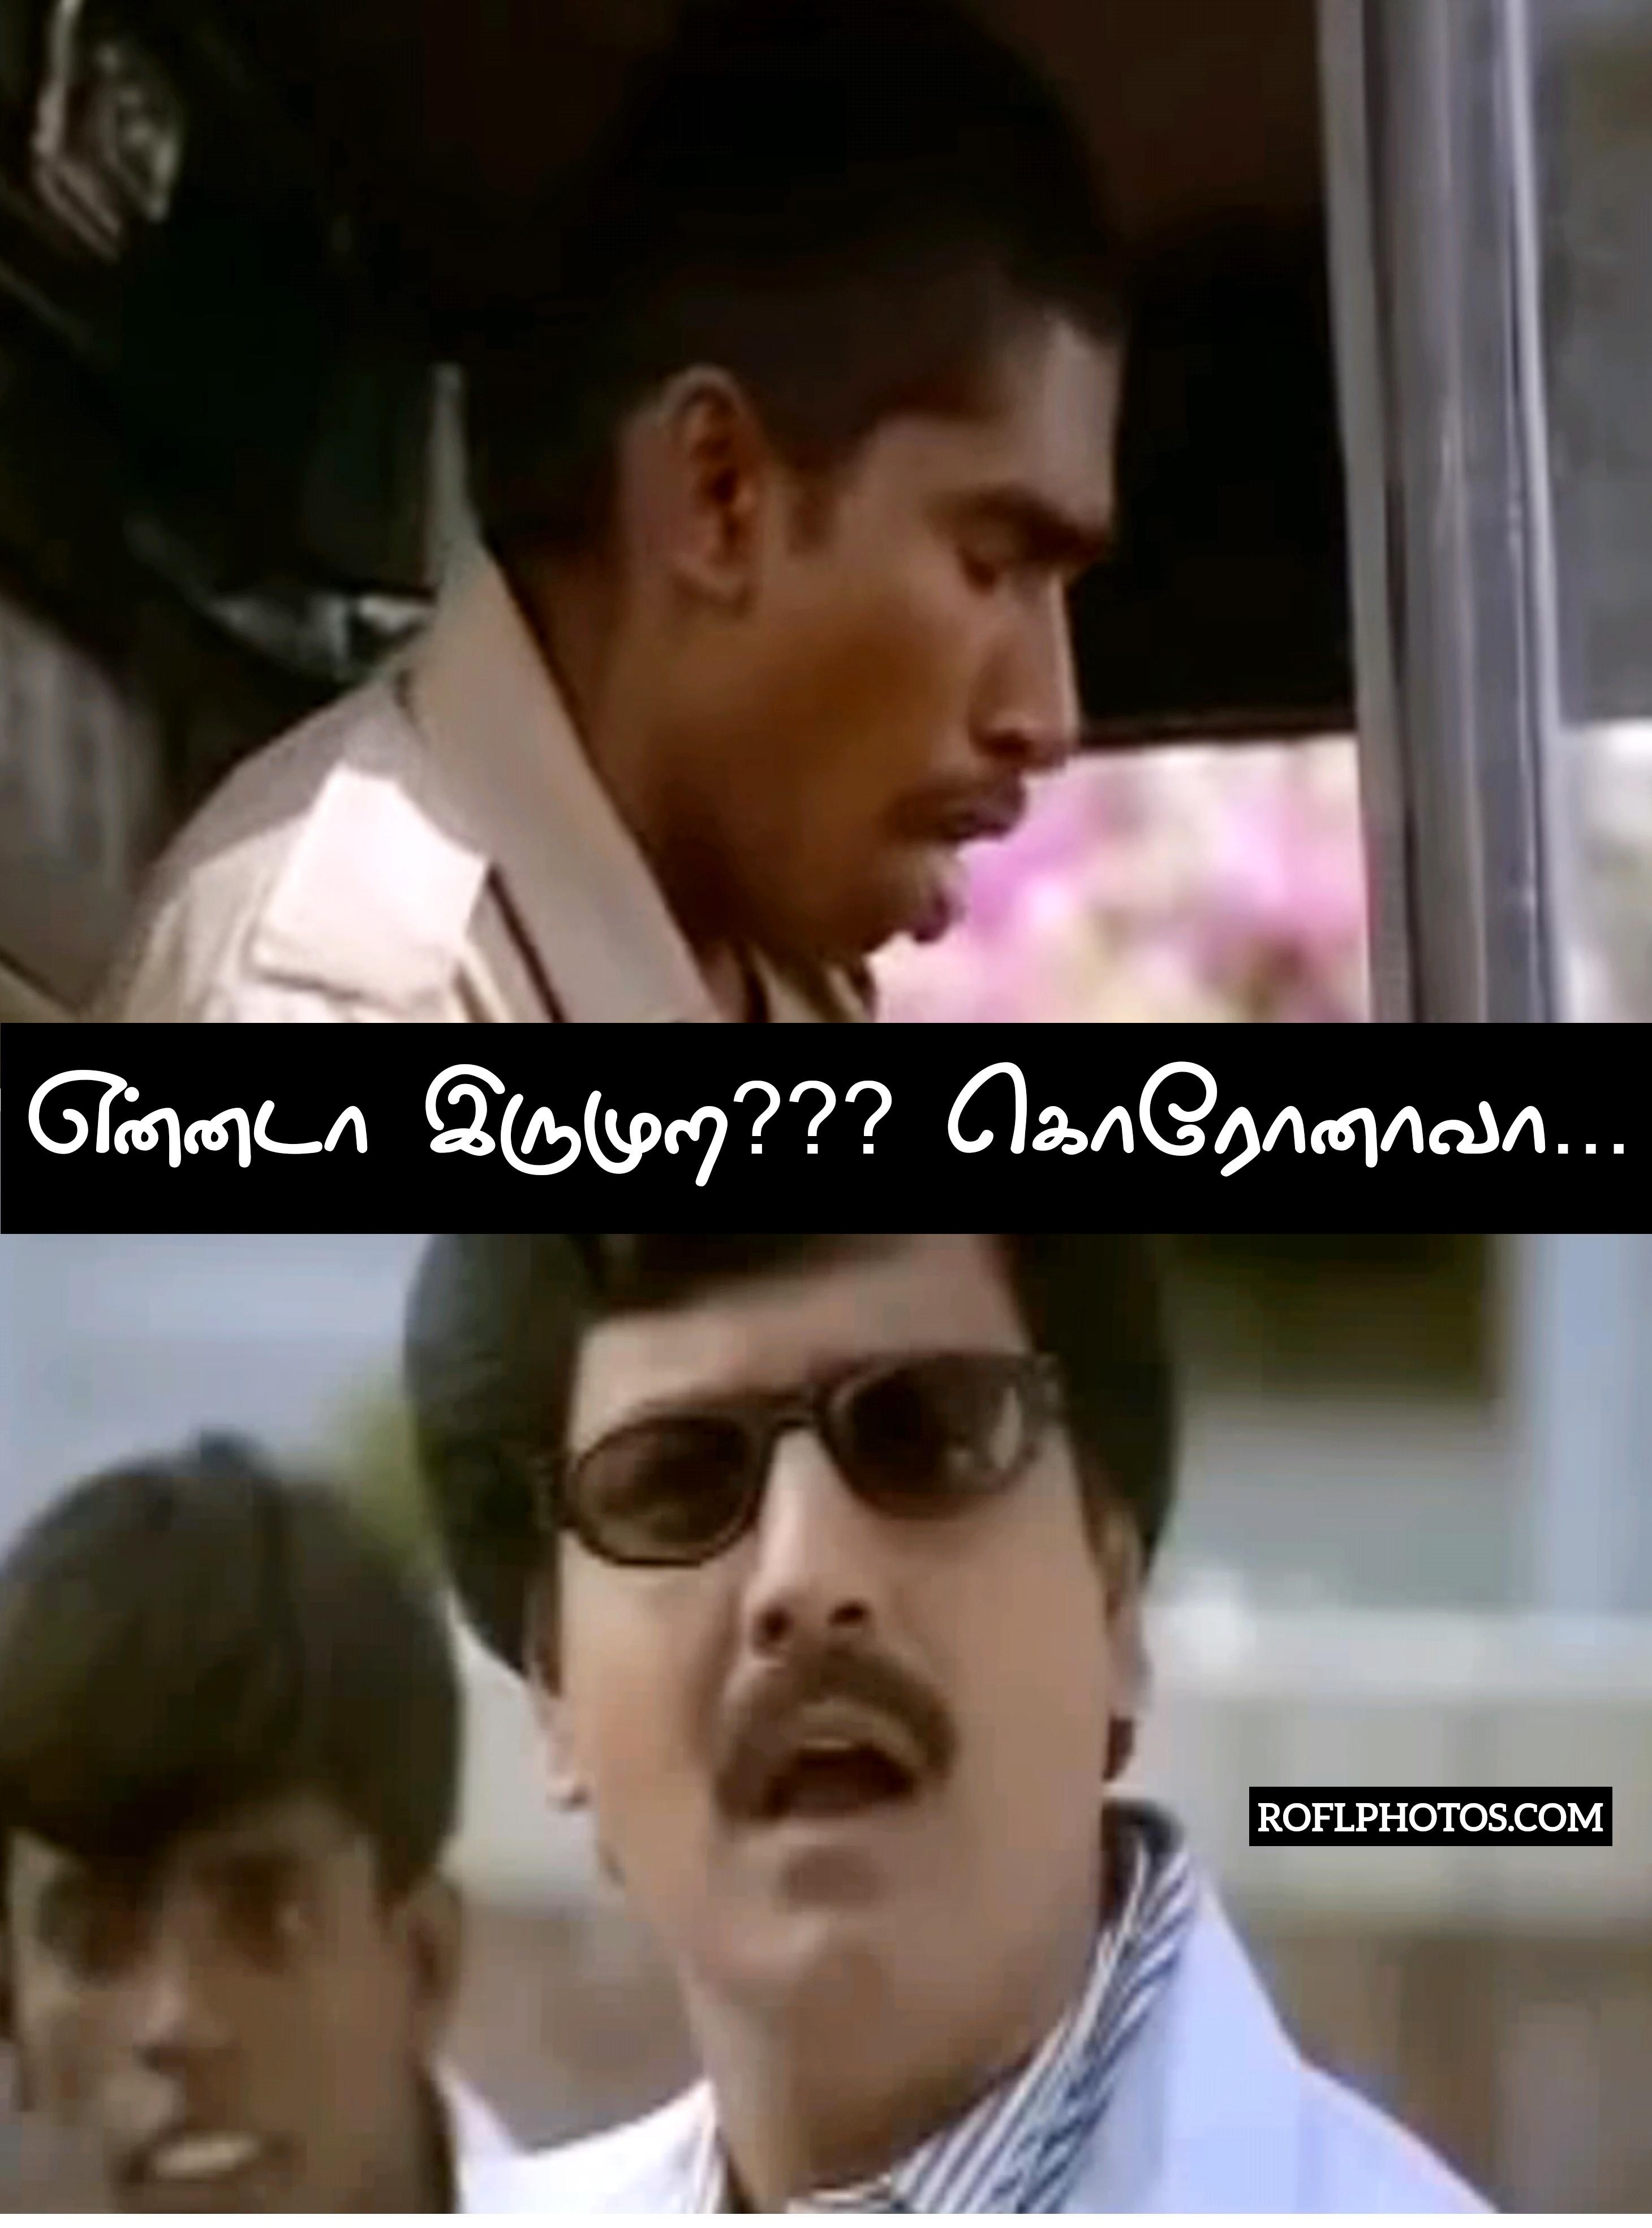 Tamil Comedy Memes Vivek Memes Images Vivek Comedy Memes